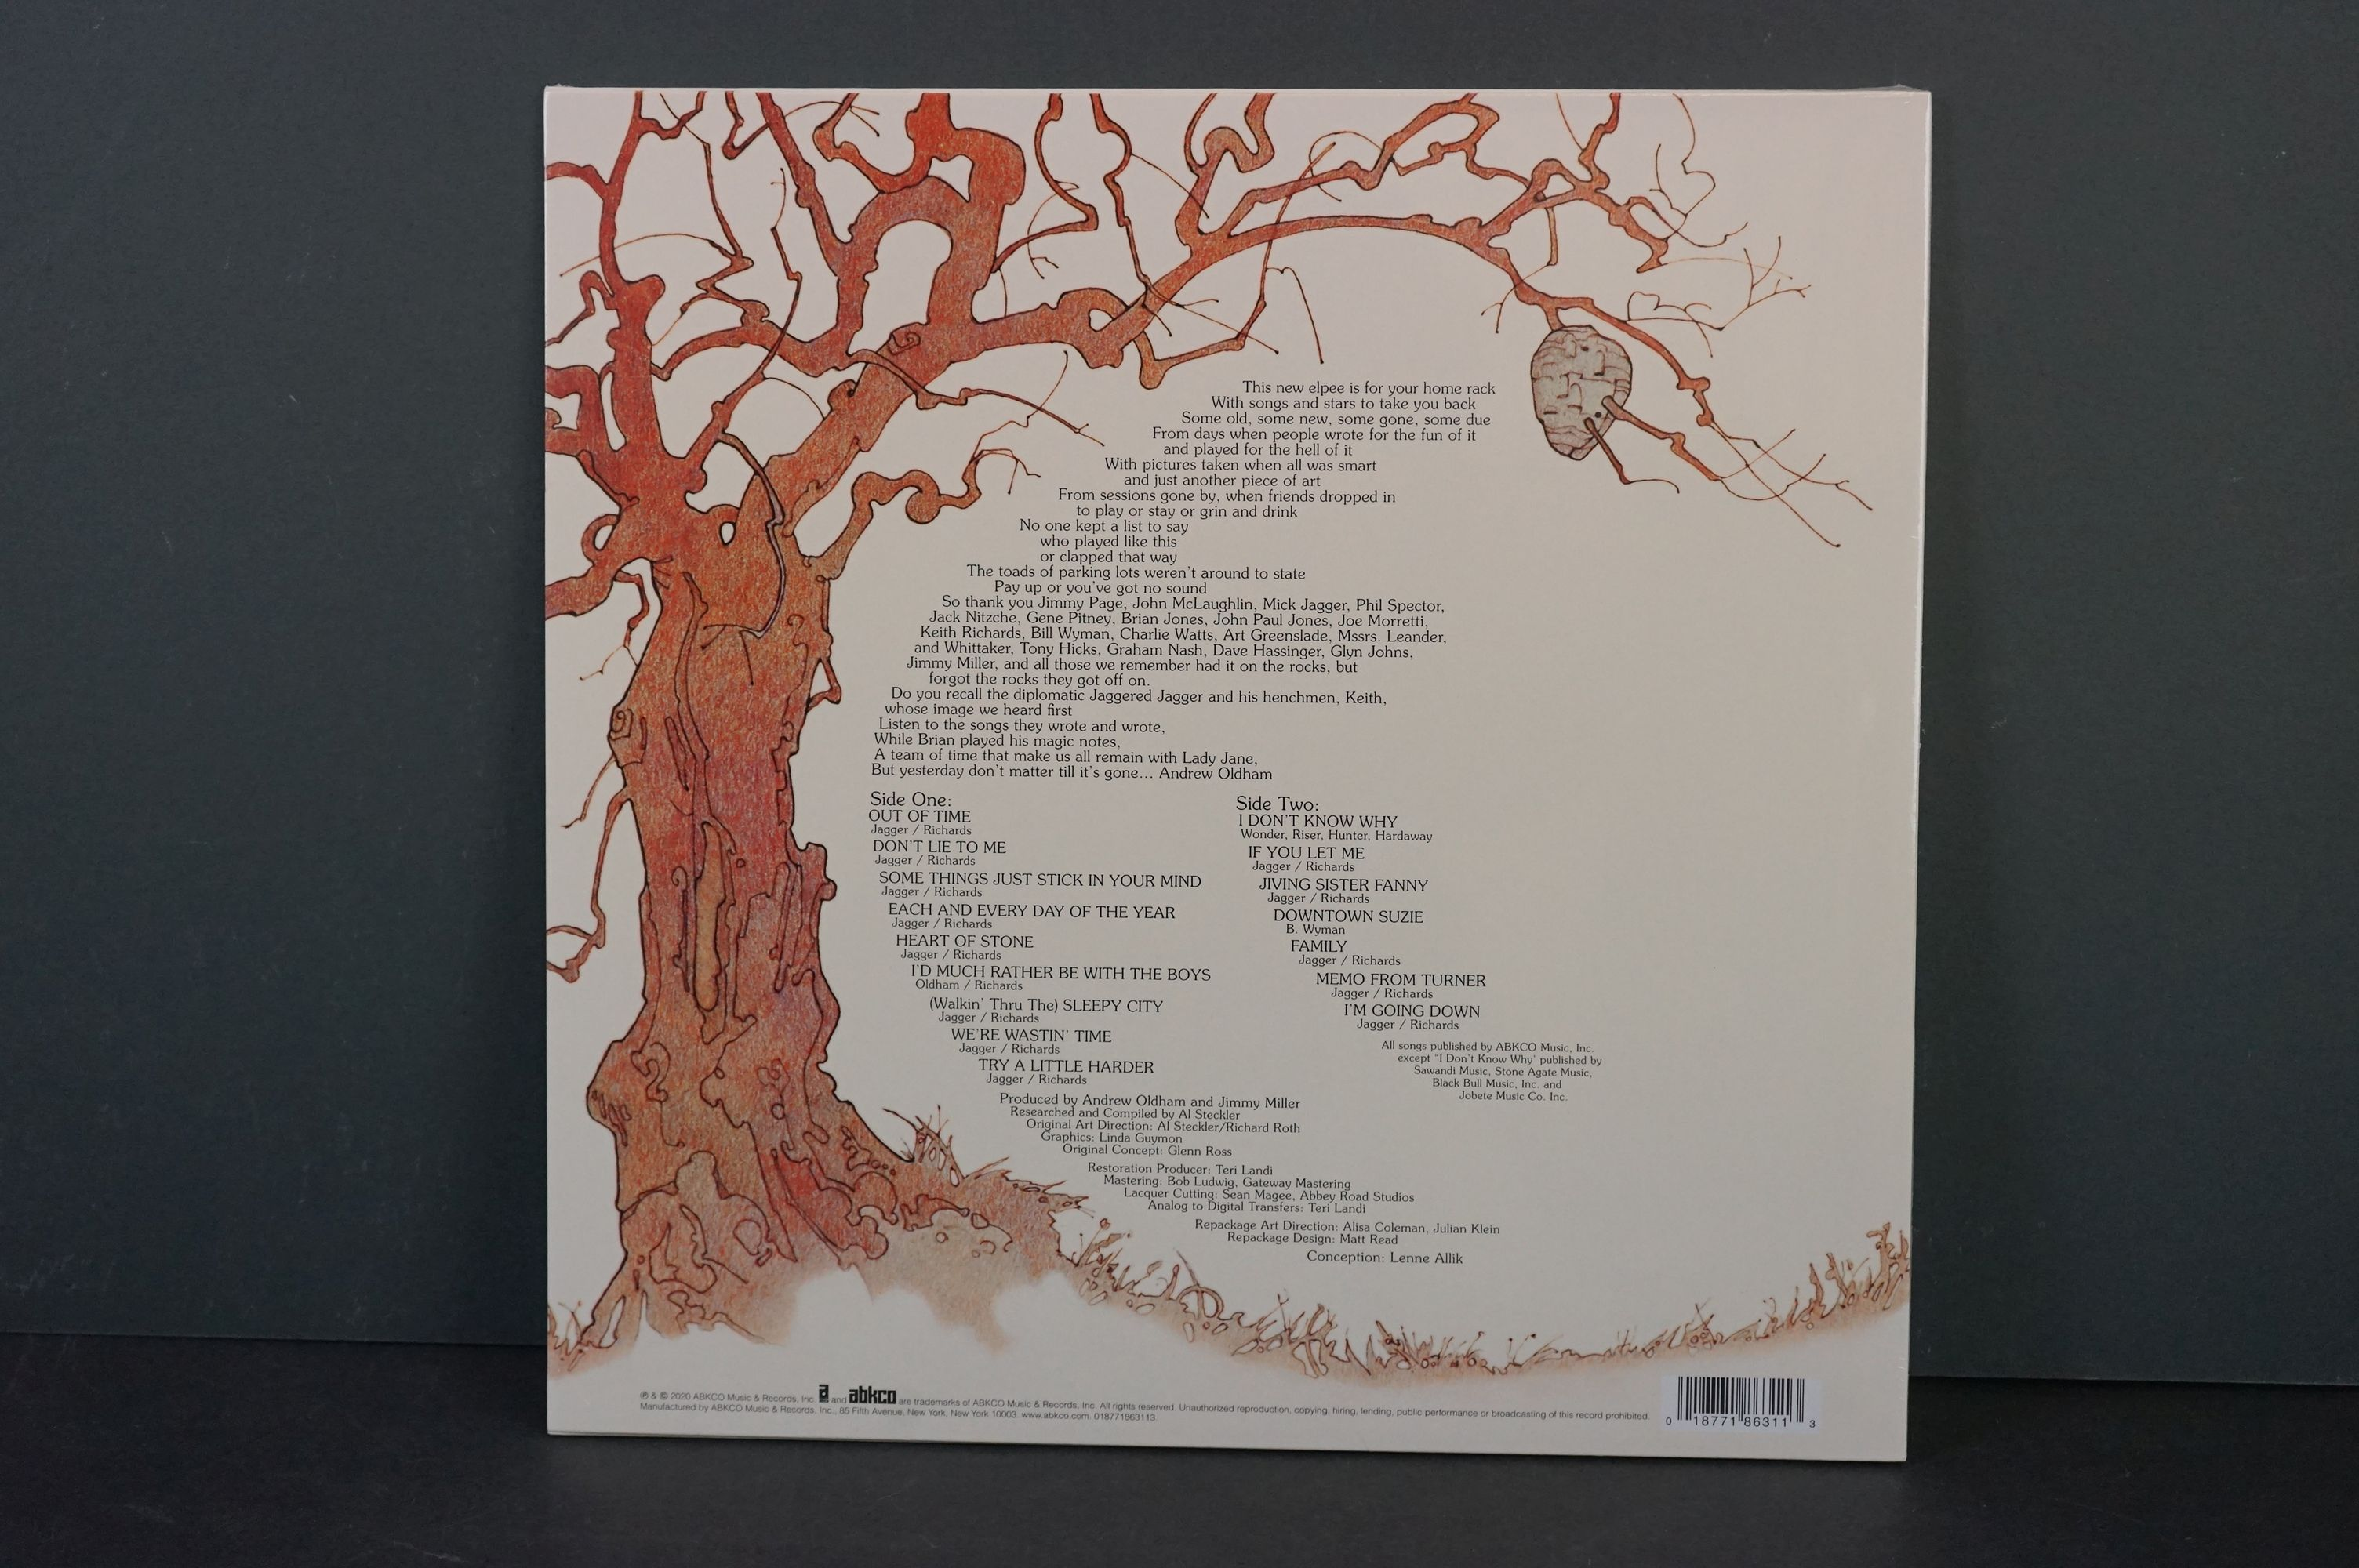 Vinyl - The Rolling Stones Metamorhosis RSD exclusive ltd edn LPABKCO 8631-1, sealed - Image 2 of 2